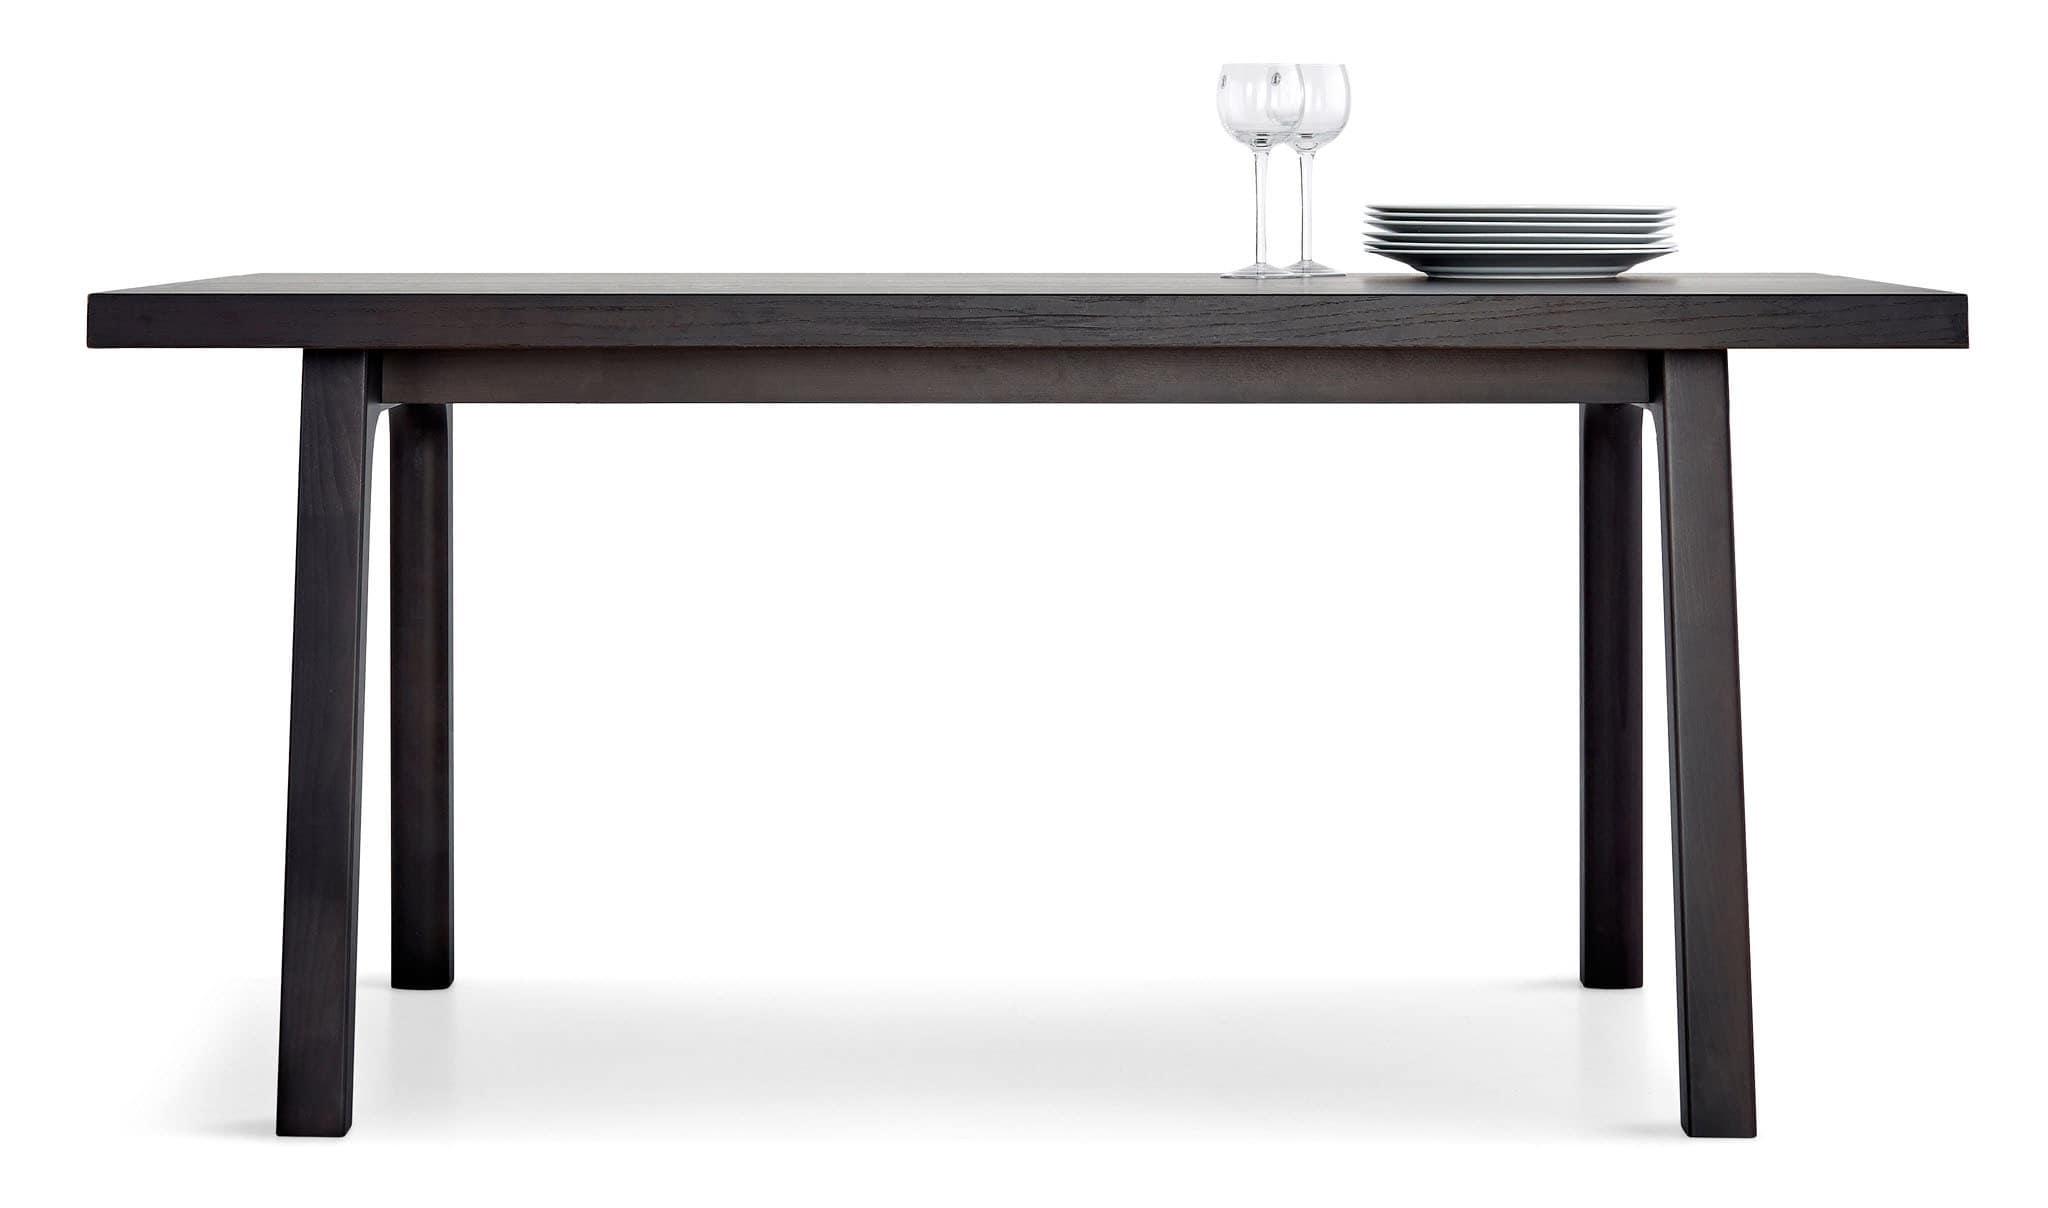 Mesas De Comedor Extensibles Ikea Ipdd Mesas De Edor Pra Online Ikea